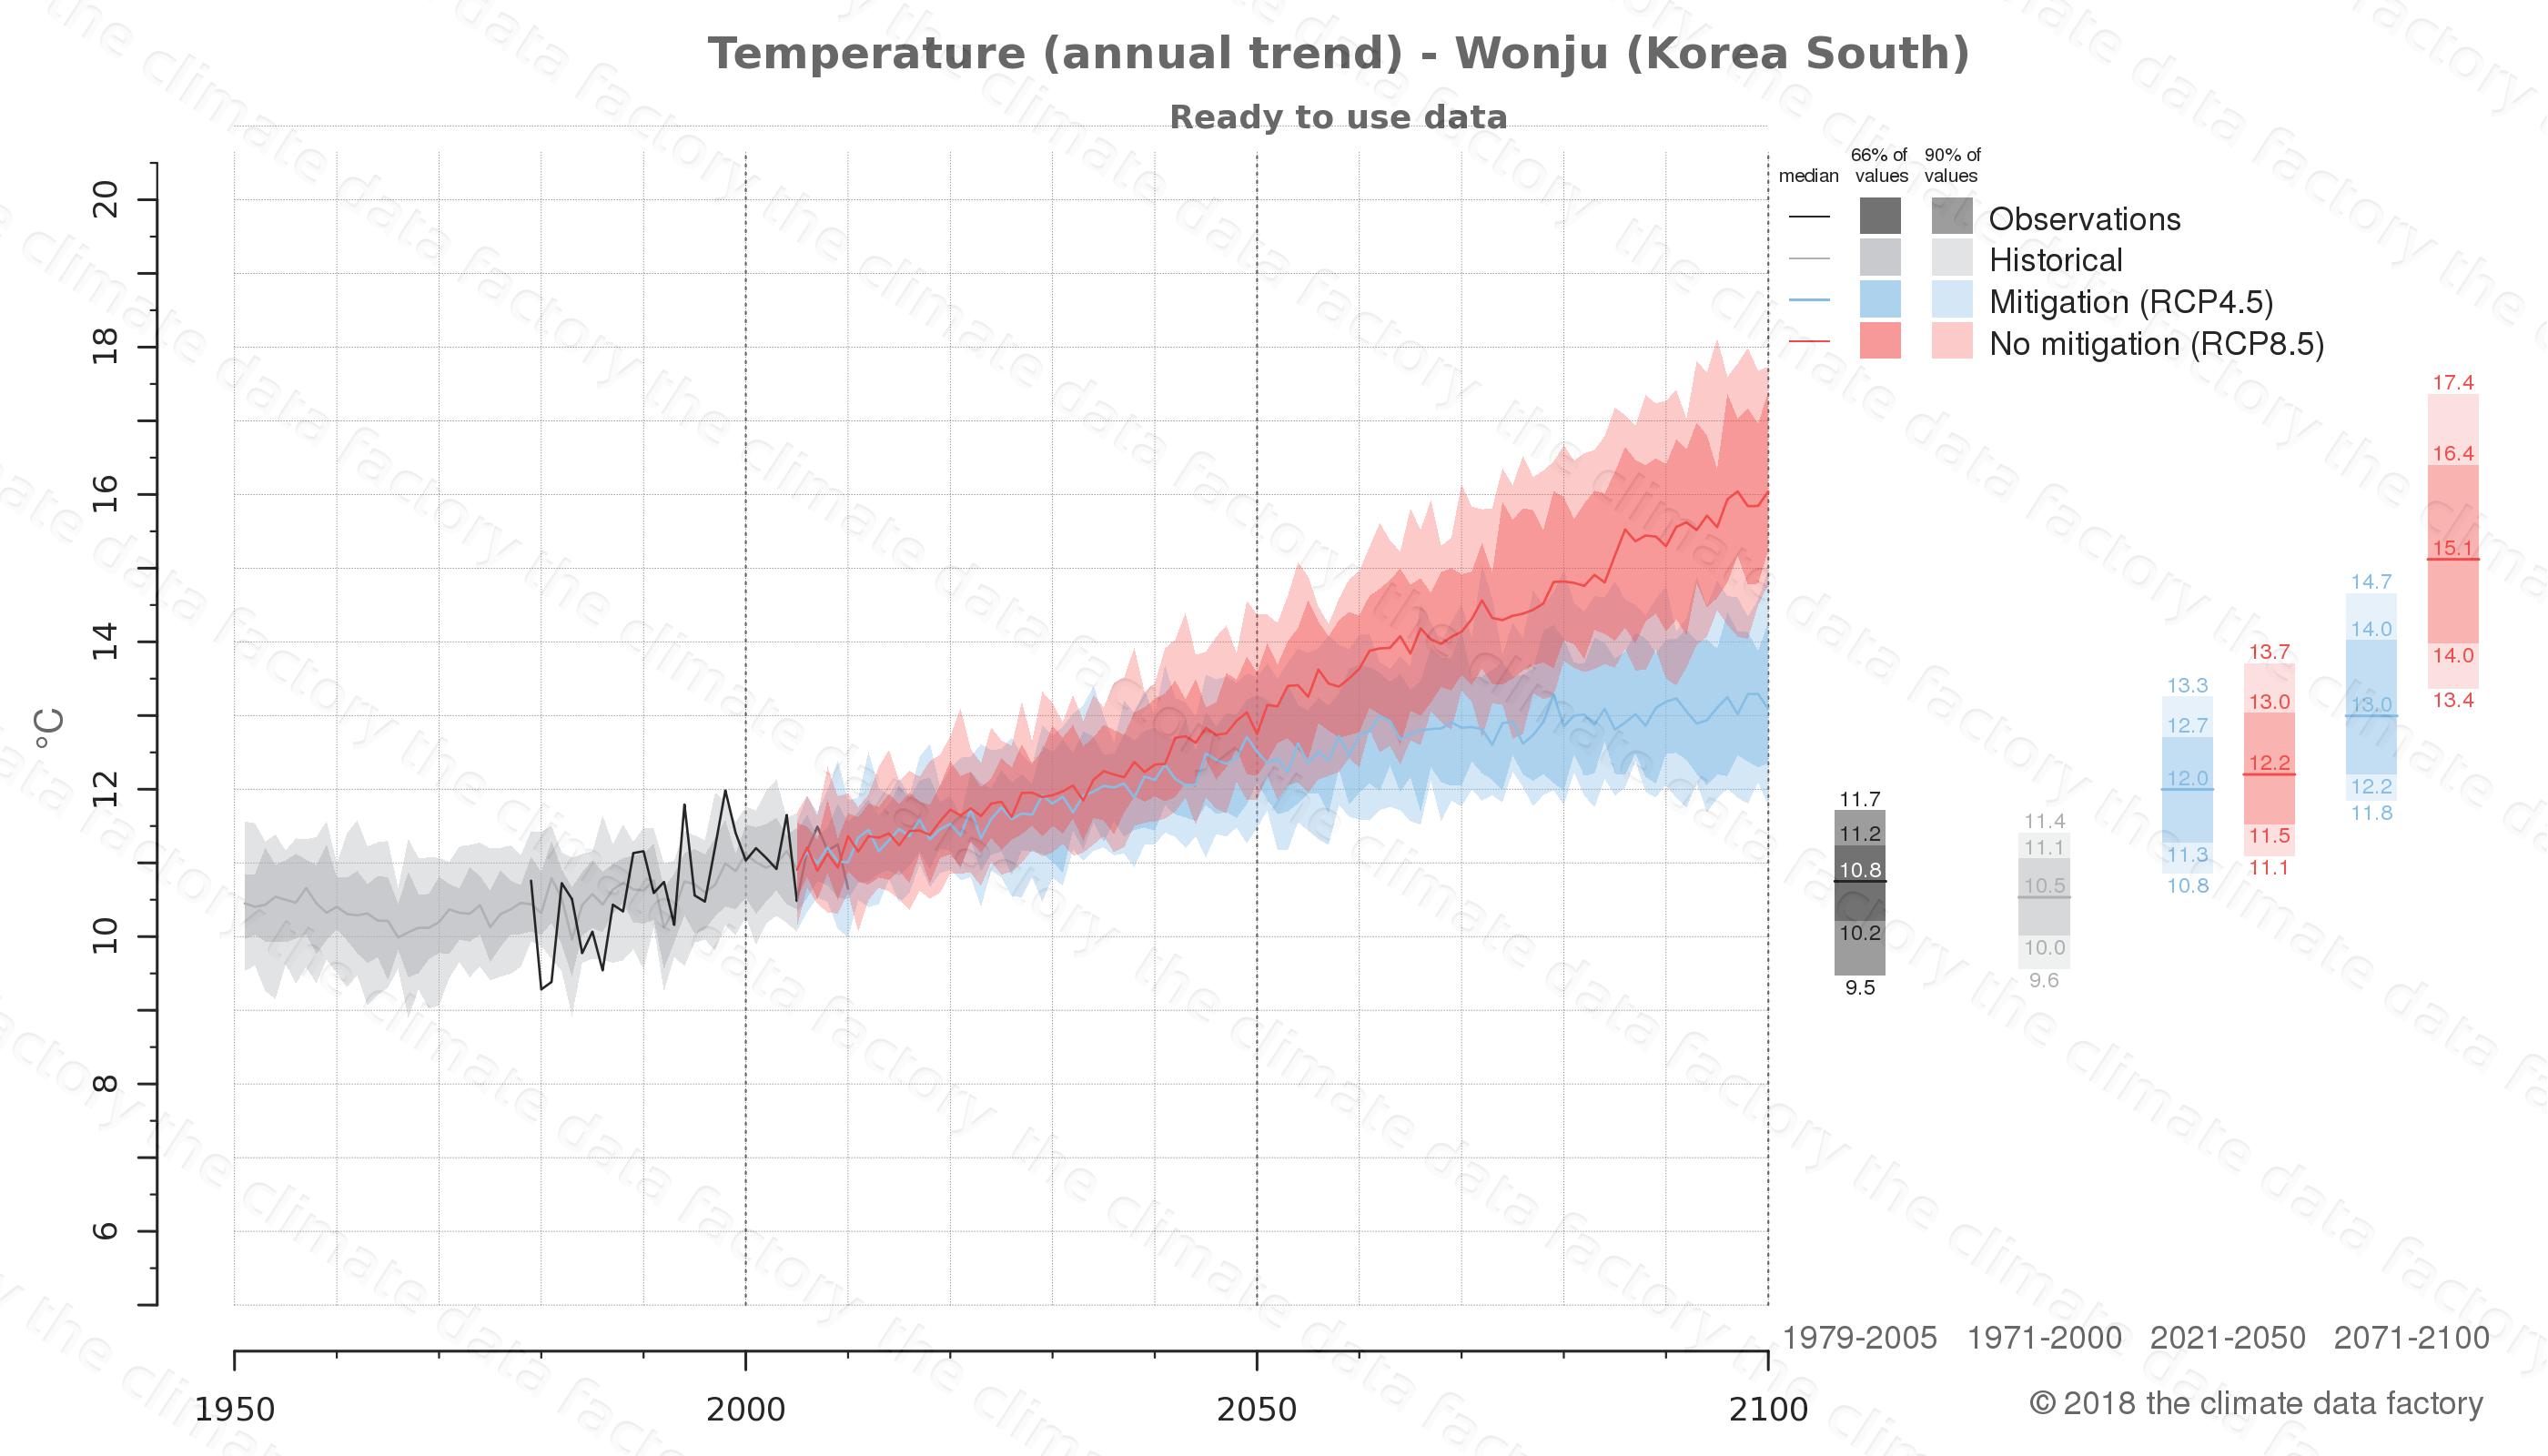 climate change data policy adaptation climate graph city data temperature wonju south korea